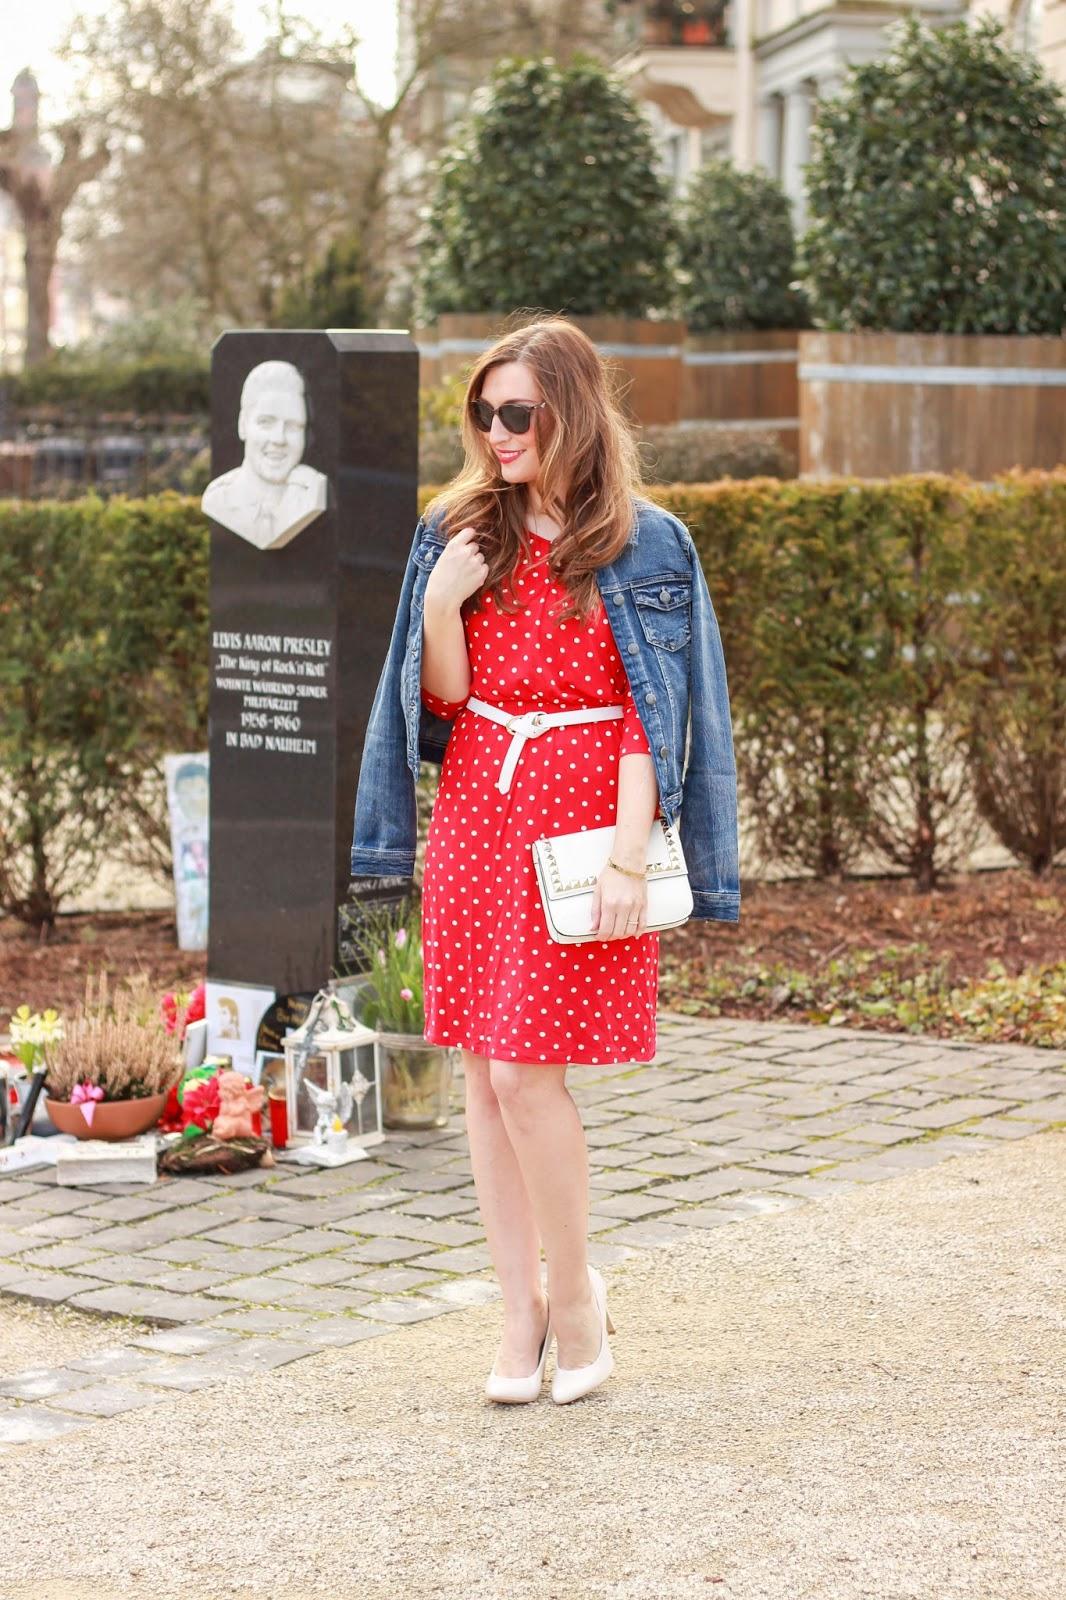 Deutsche Fashionblogger - Fashionblog - German Fashionblogger - Rotes Pünktchenkleid - Pünktchenkleid